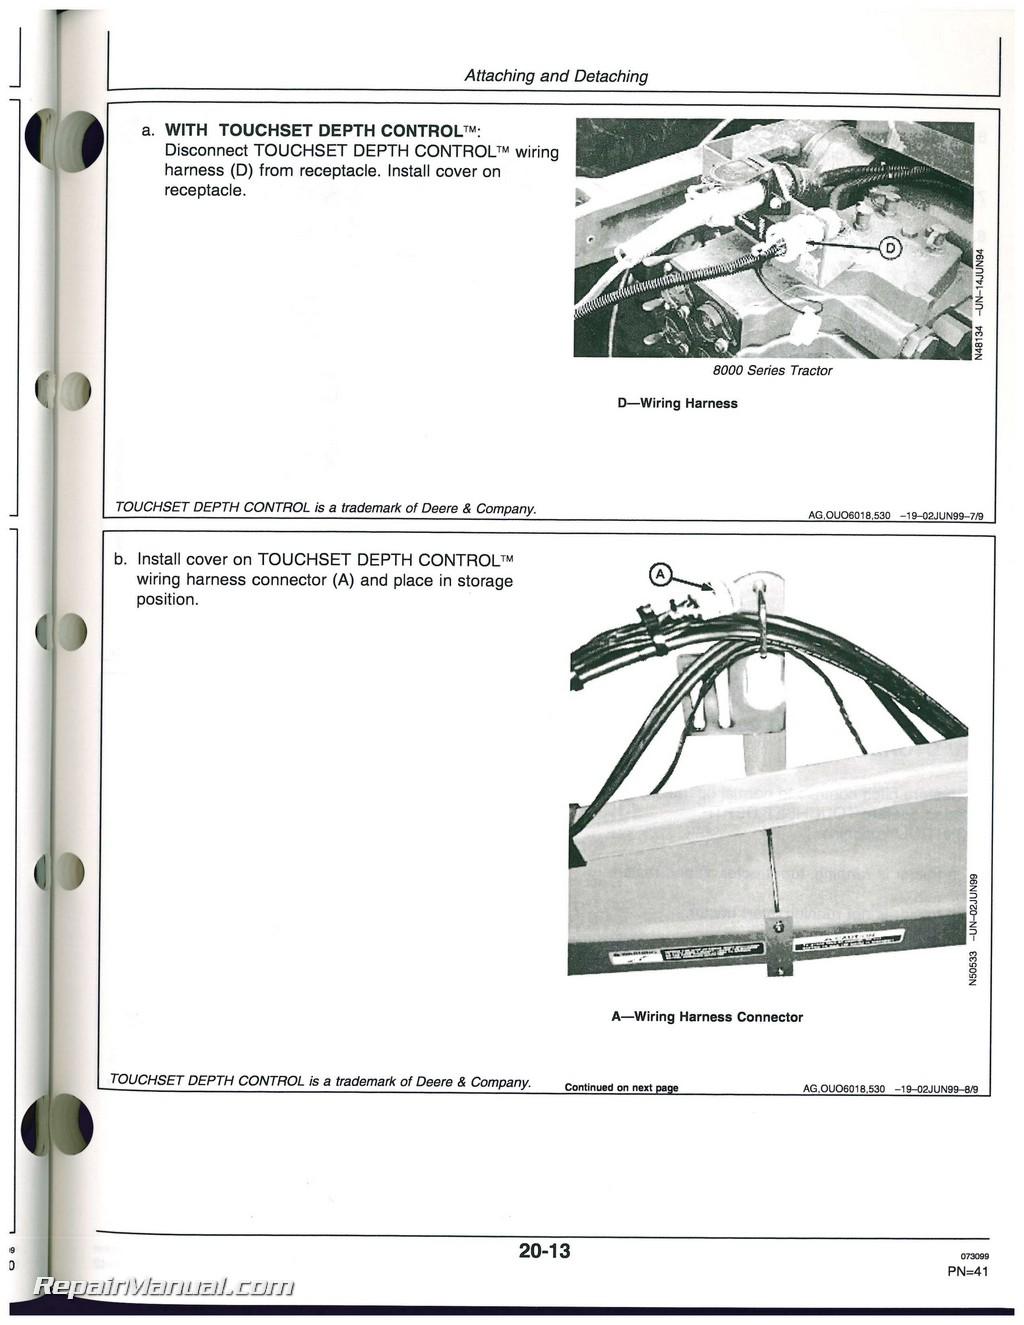 Used John Deere 512 Disk Ripper Operators Manual Wiring Harness Connectors